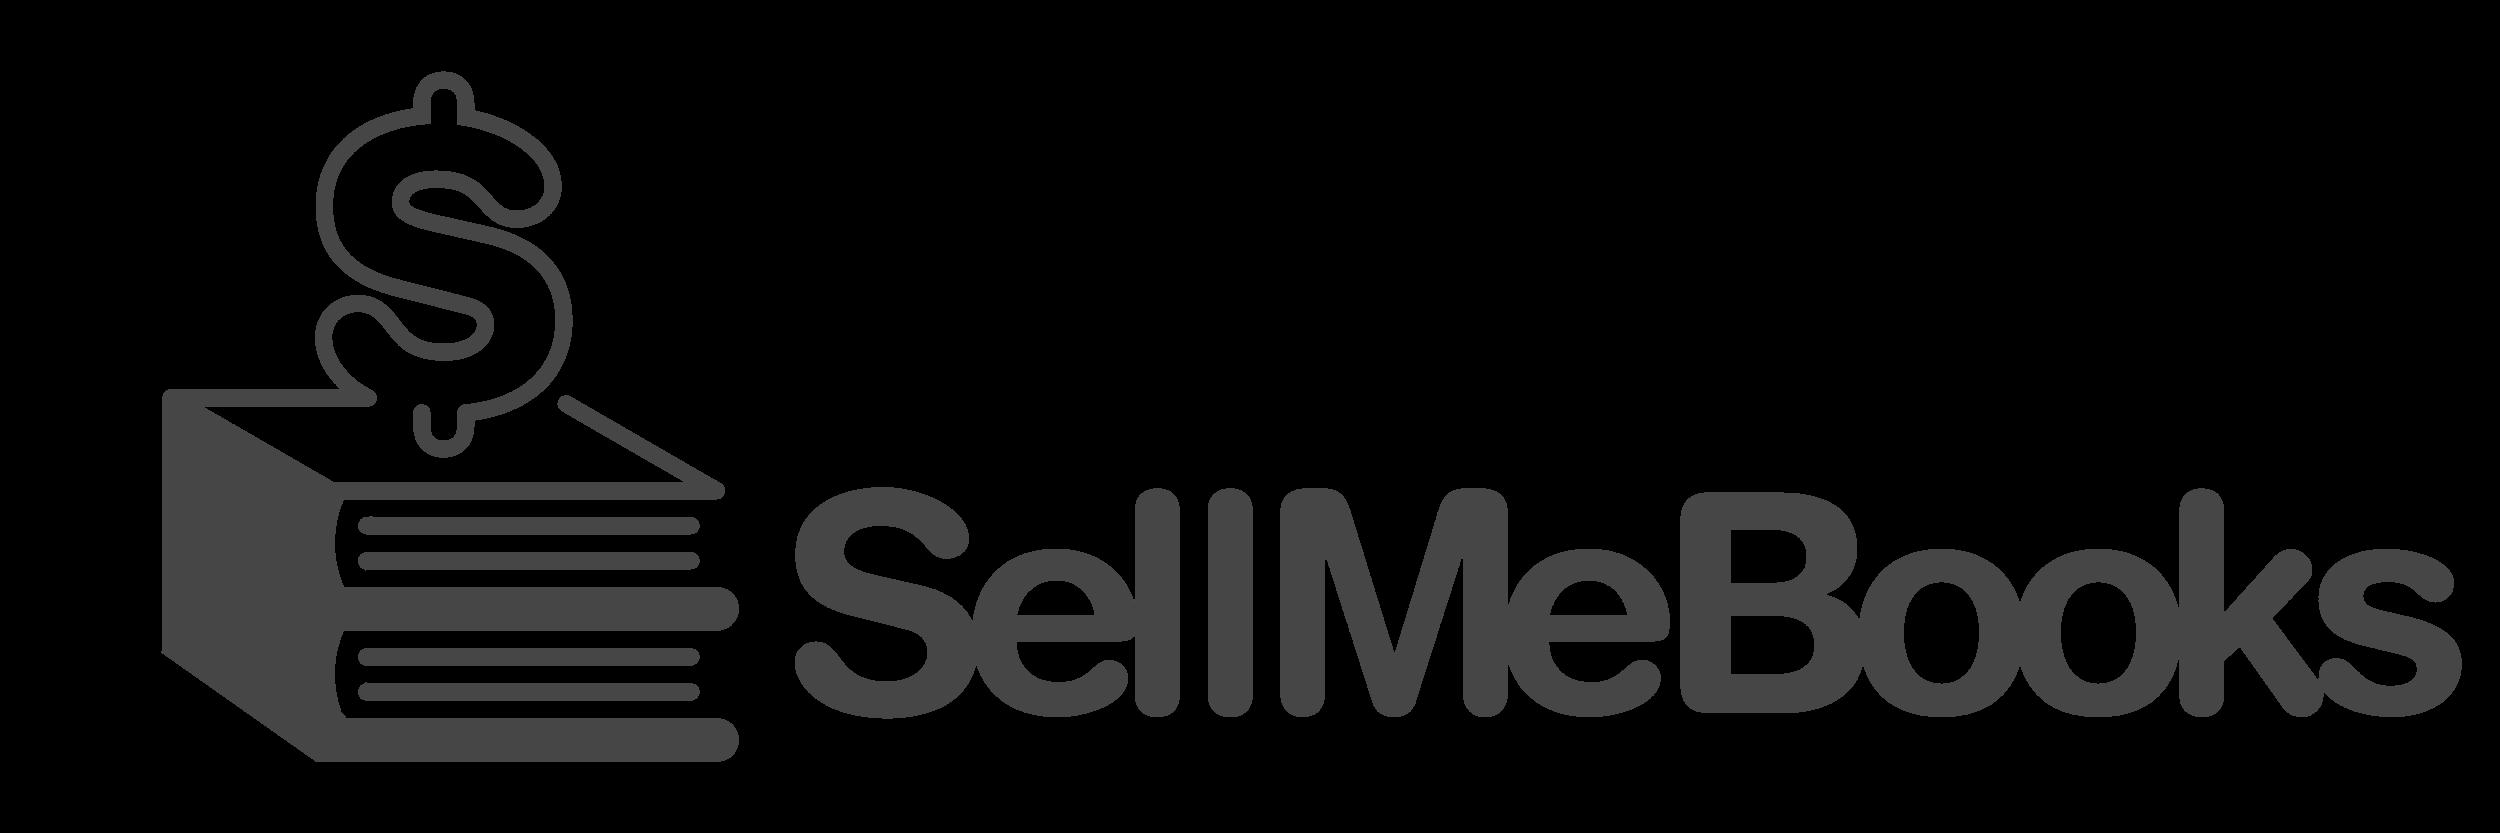 sellmebooks logo dark.png